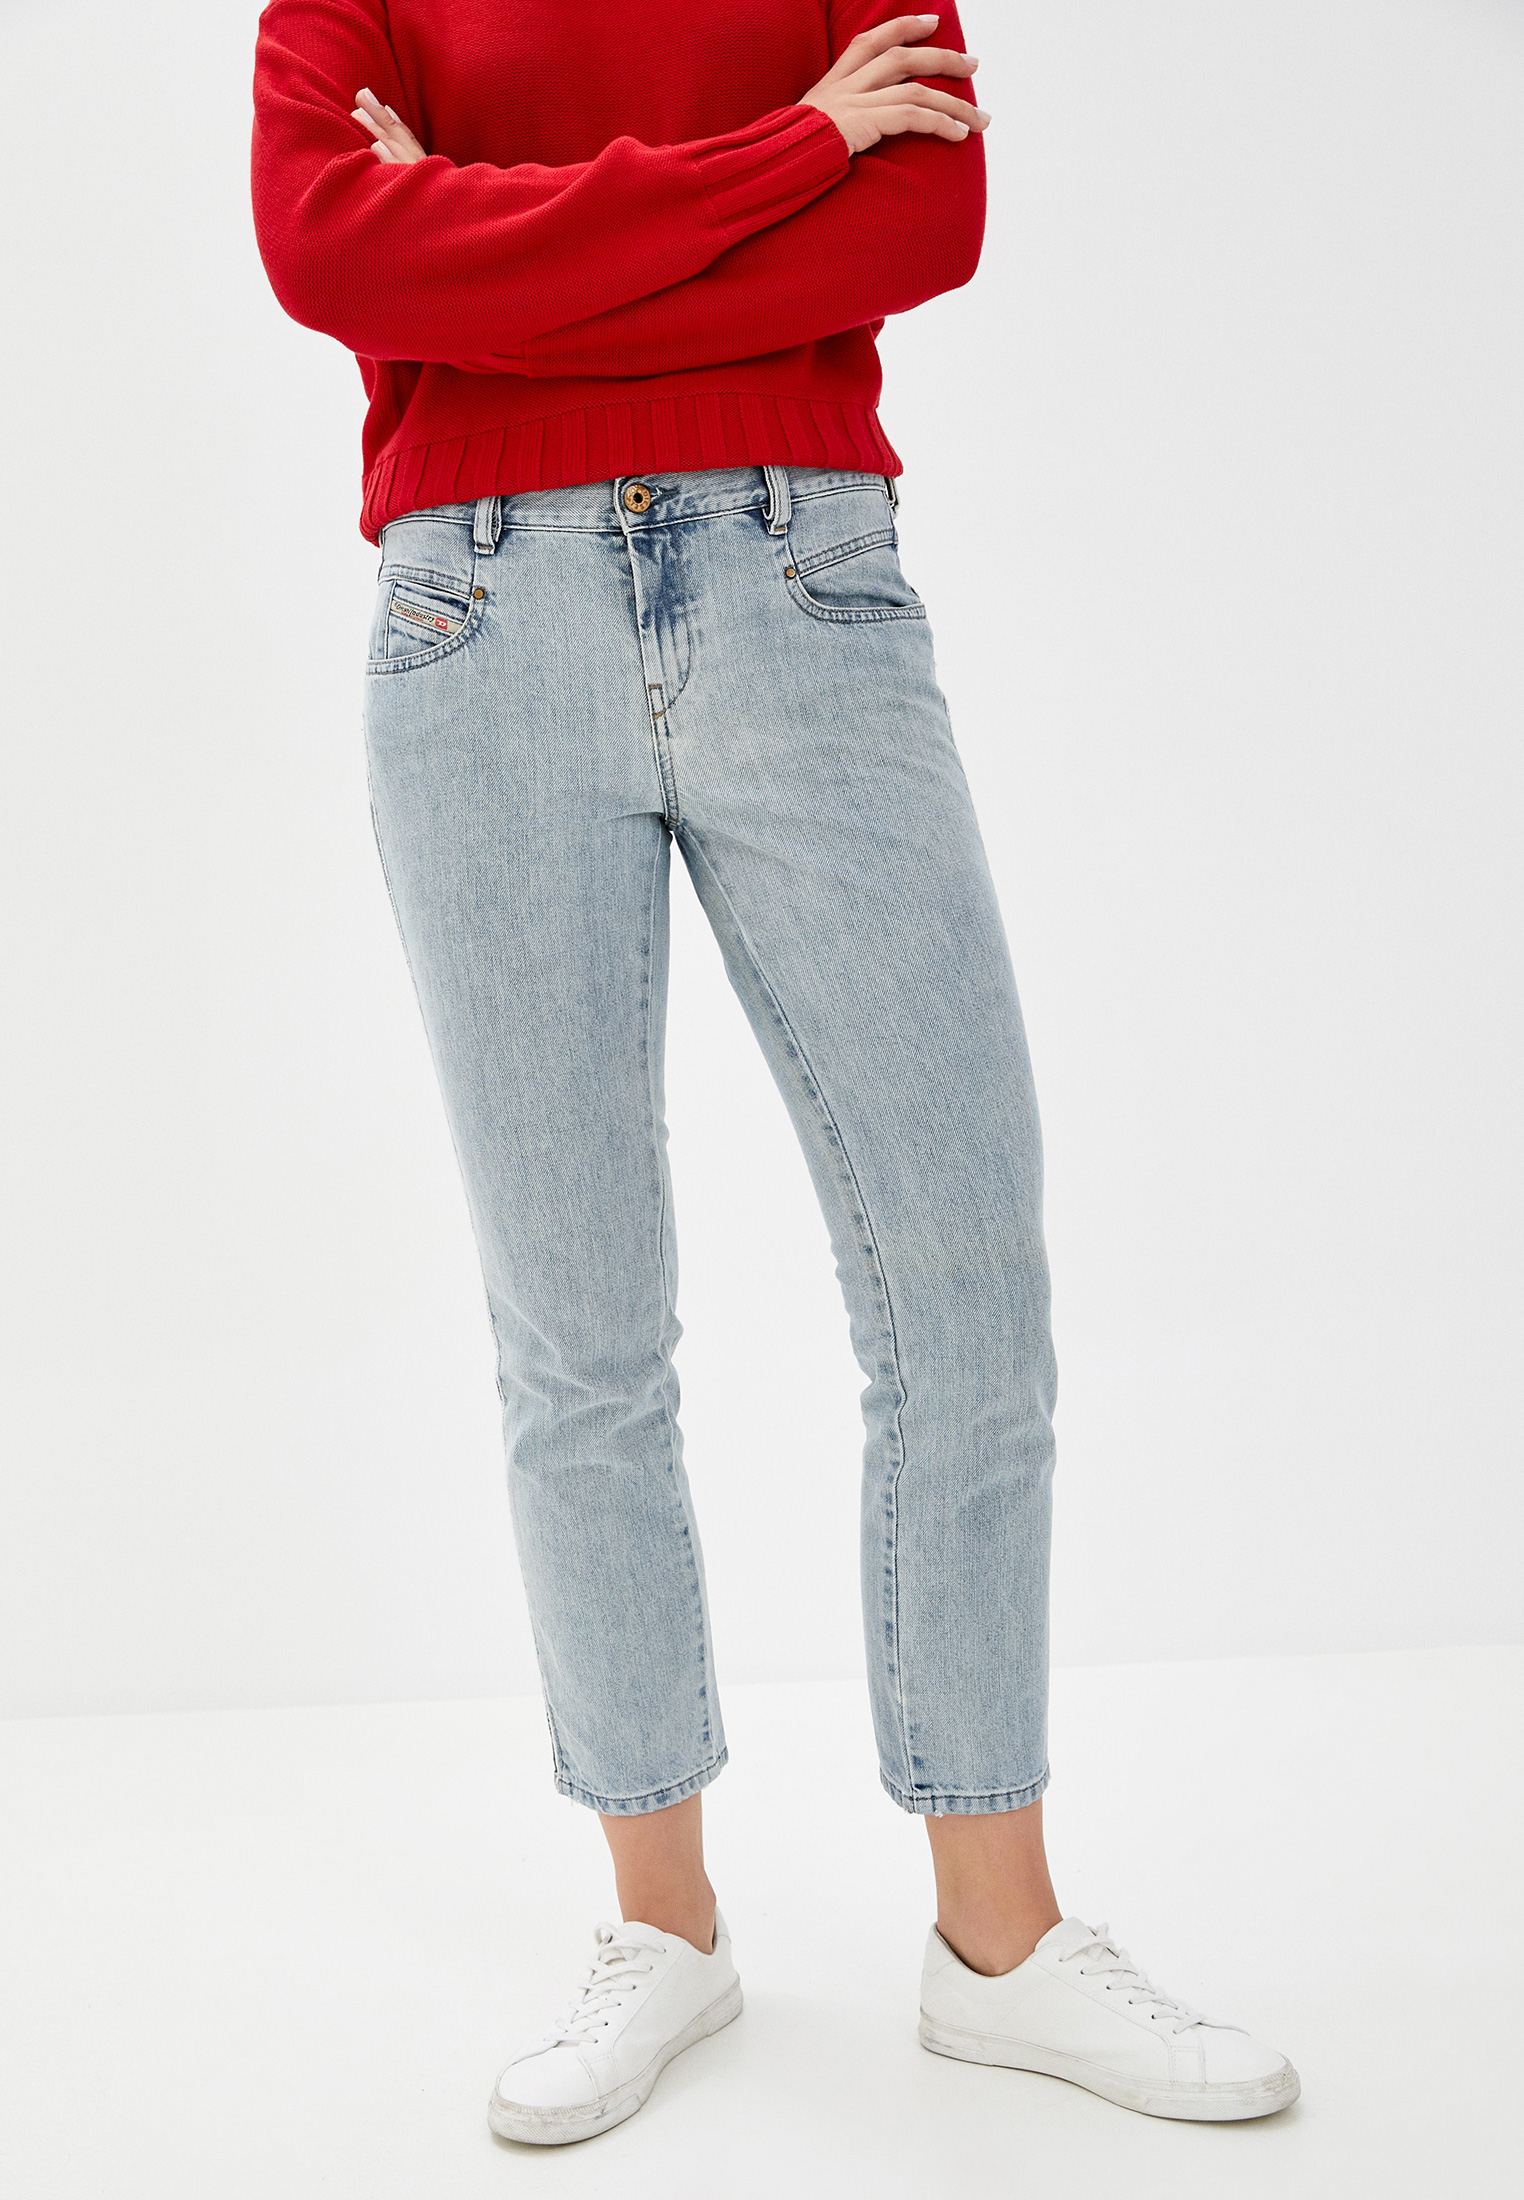 Прямые джинсы Diesel (Дизель) 00SY4S084FC